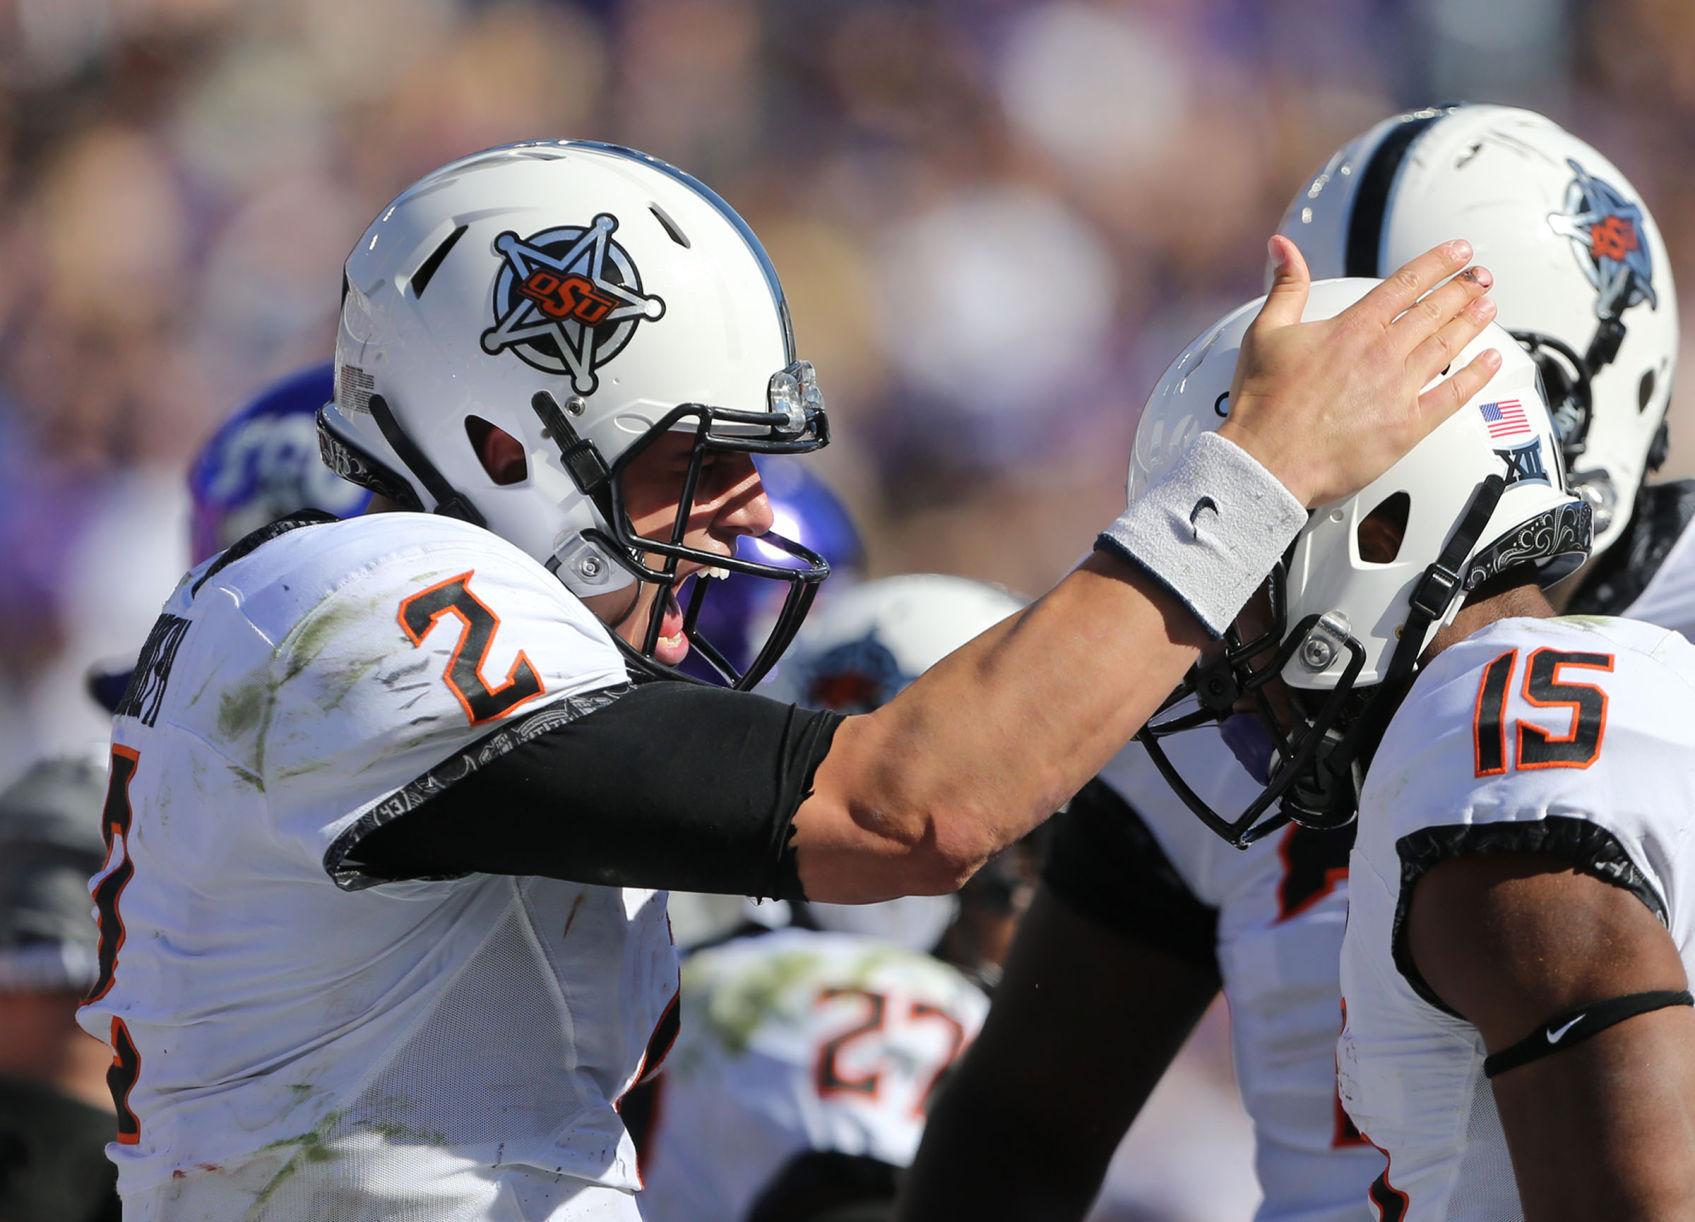 How to watch Oklahoma State vs. TCU